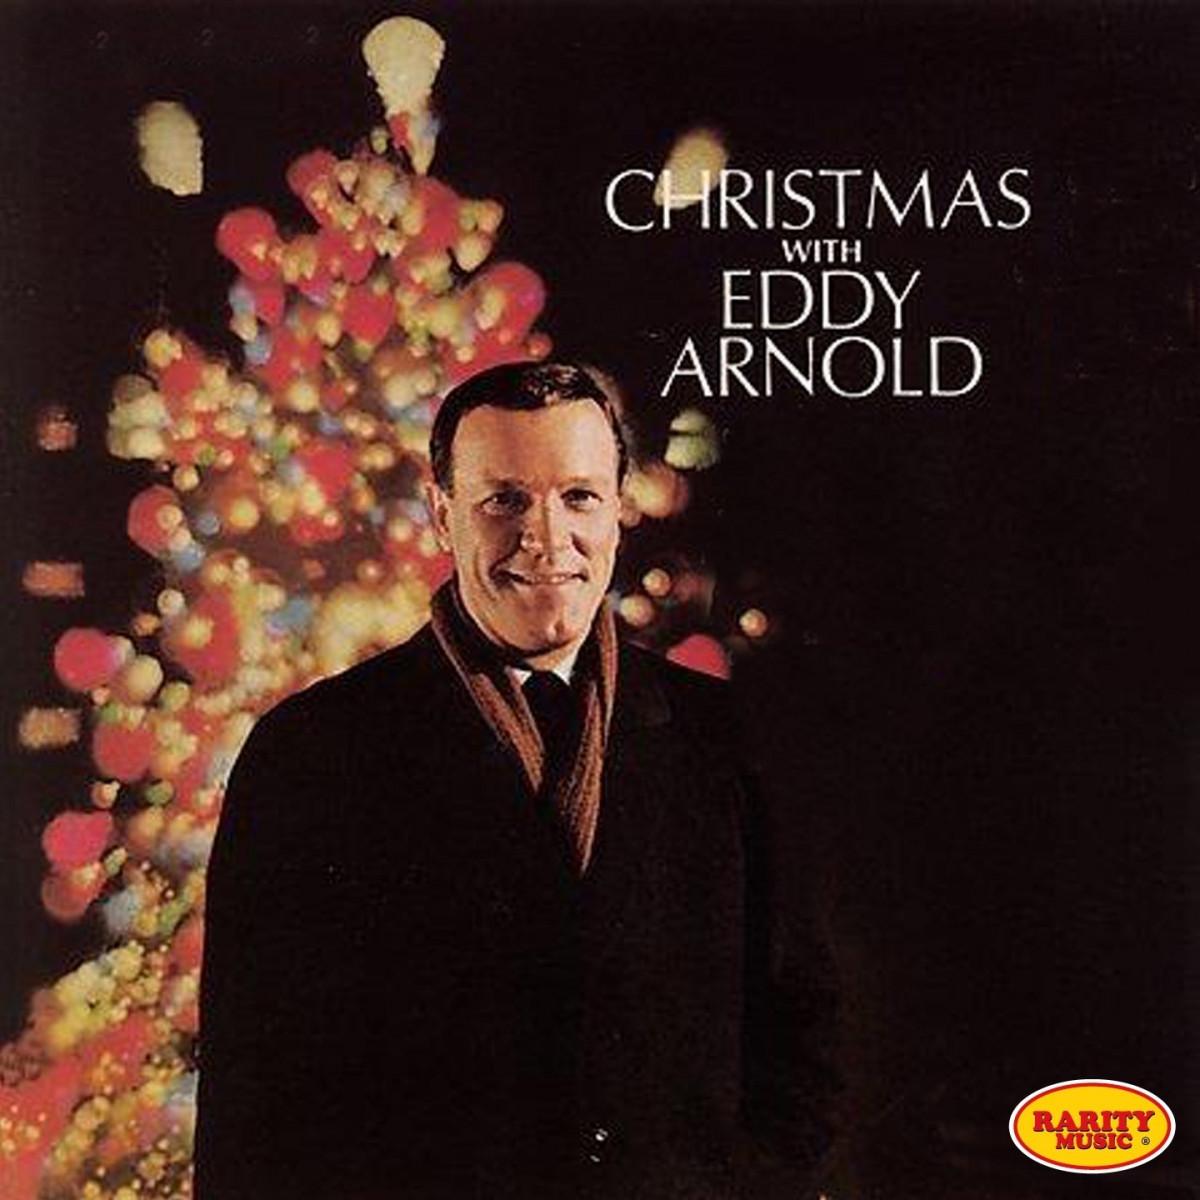 Eddy Arnold - Jolly old Saint Nicholas